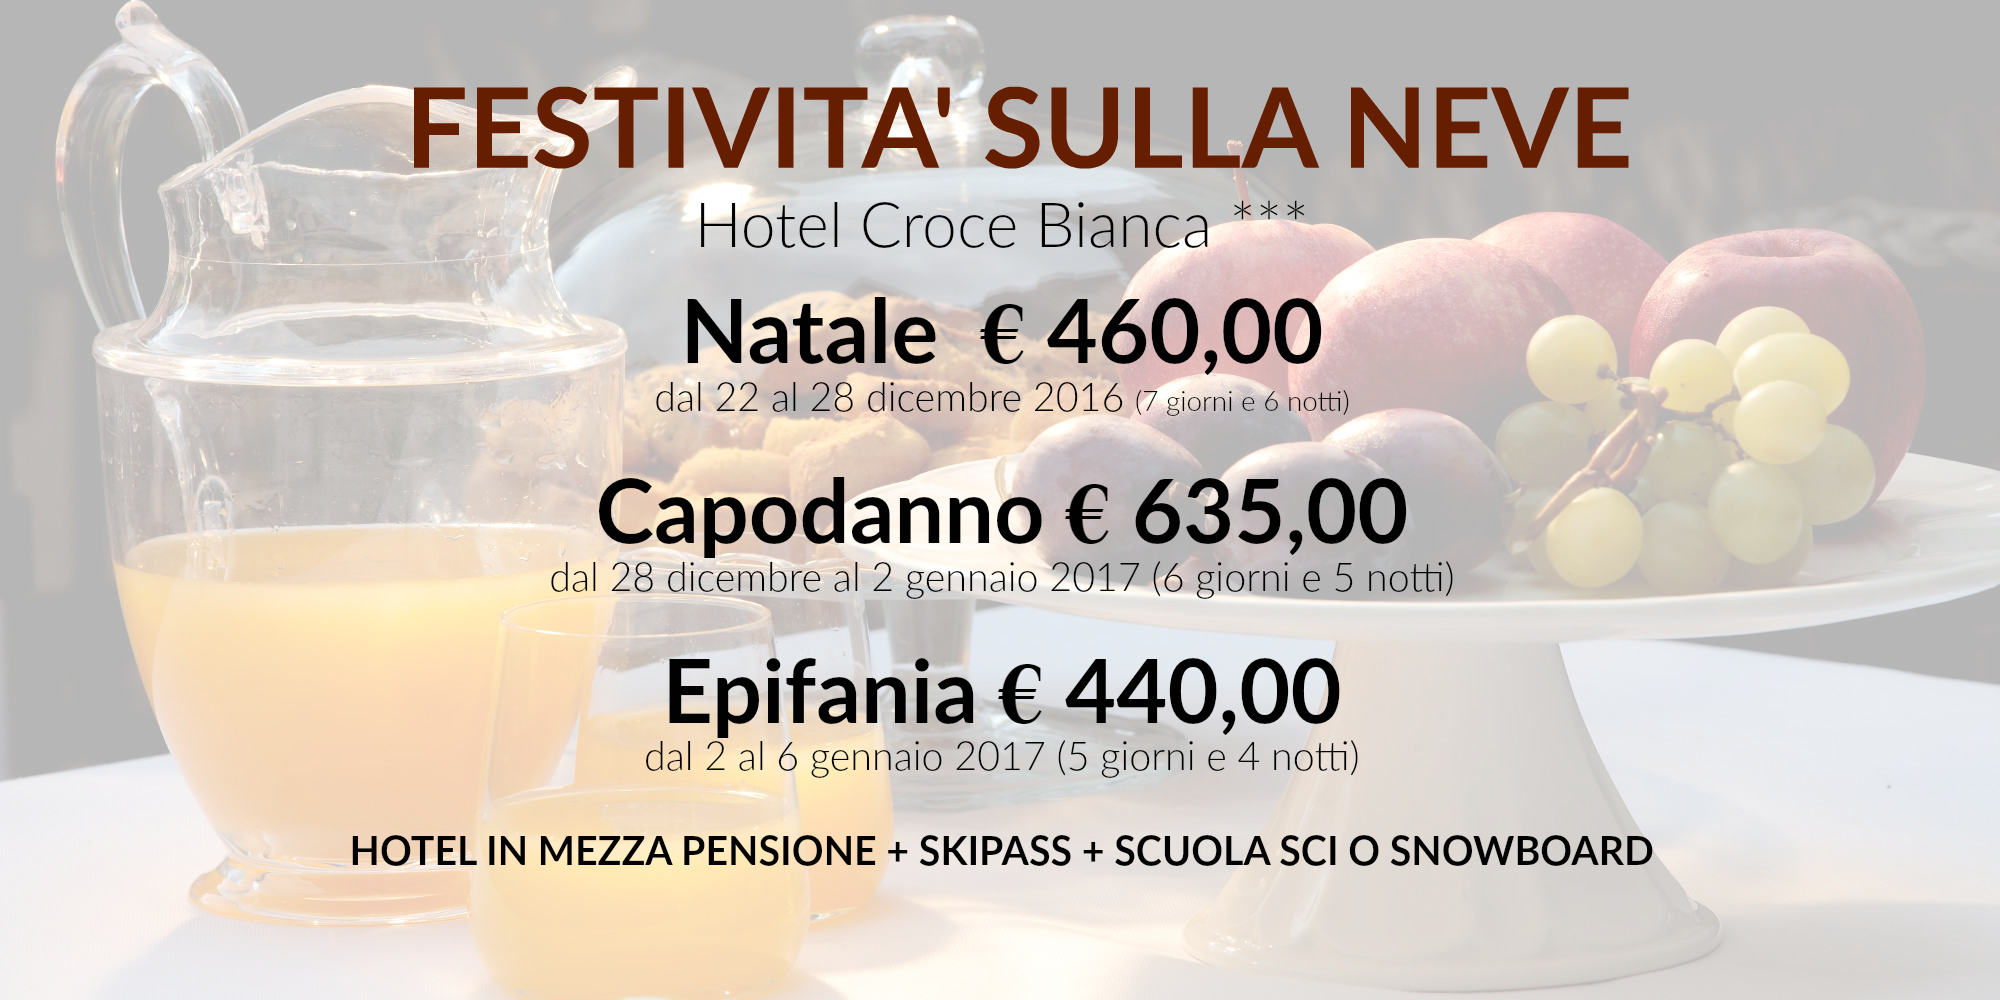 Offerta feste natale sulla neve ad asiago hotel in centro for Asiago offerte